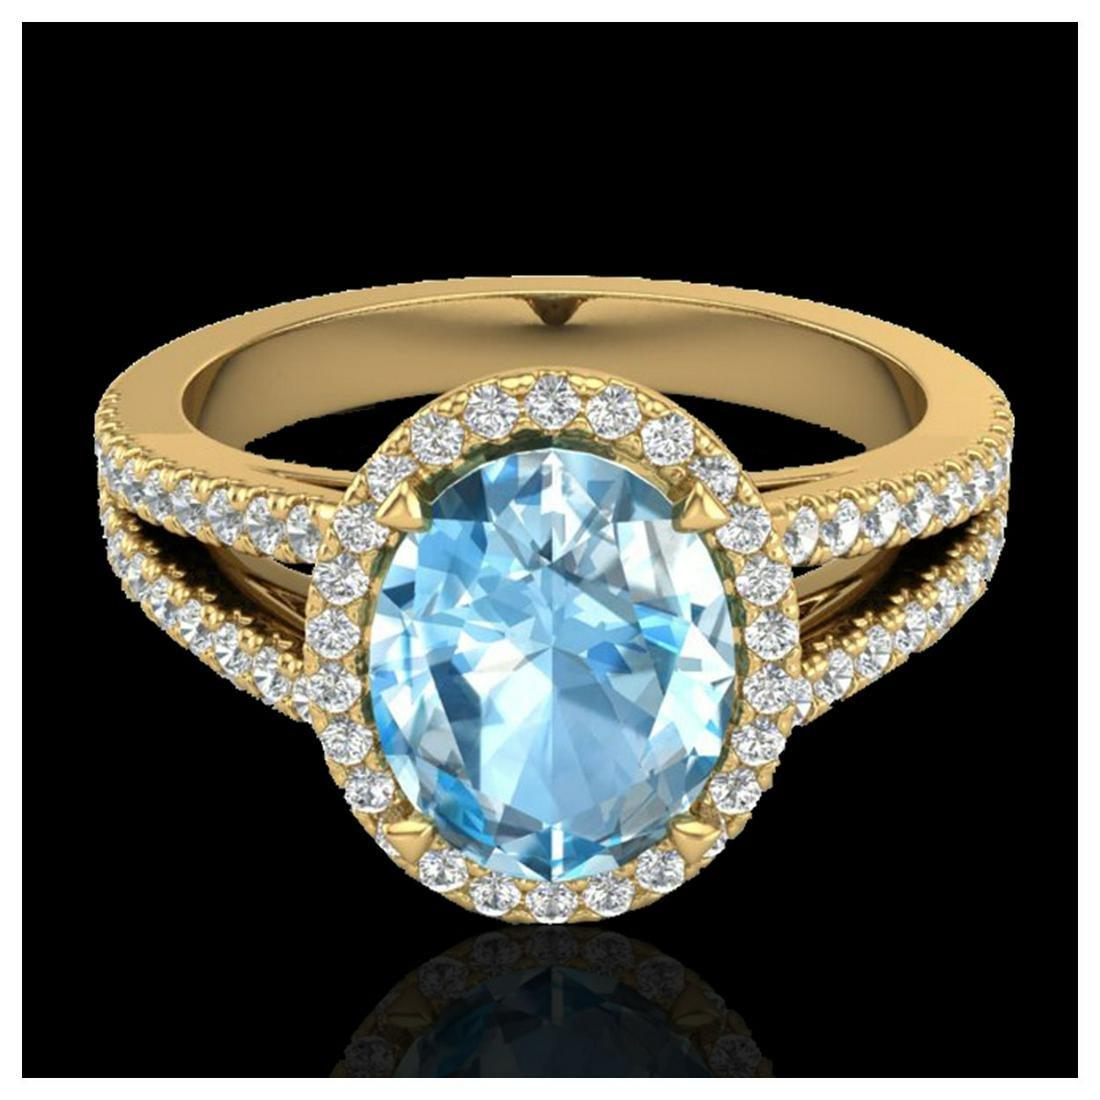 3 Sky Blue Topaz & VS/SI Diamond Halo Ring 18K Yellow